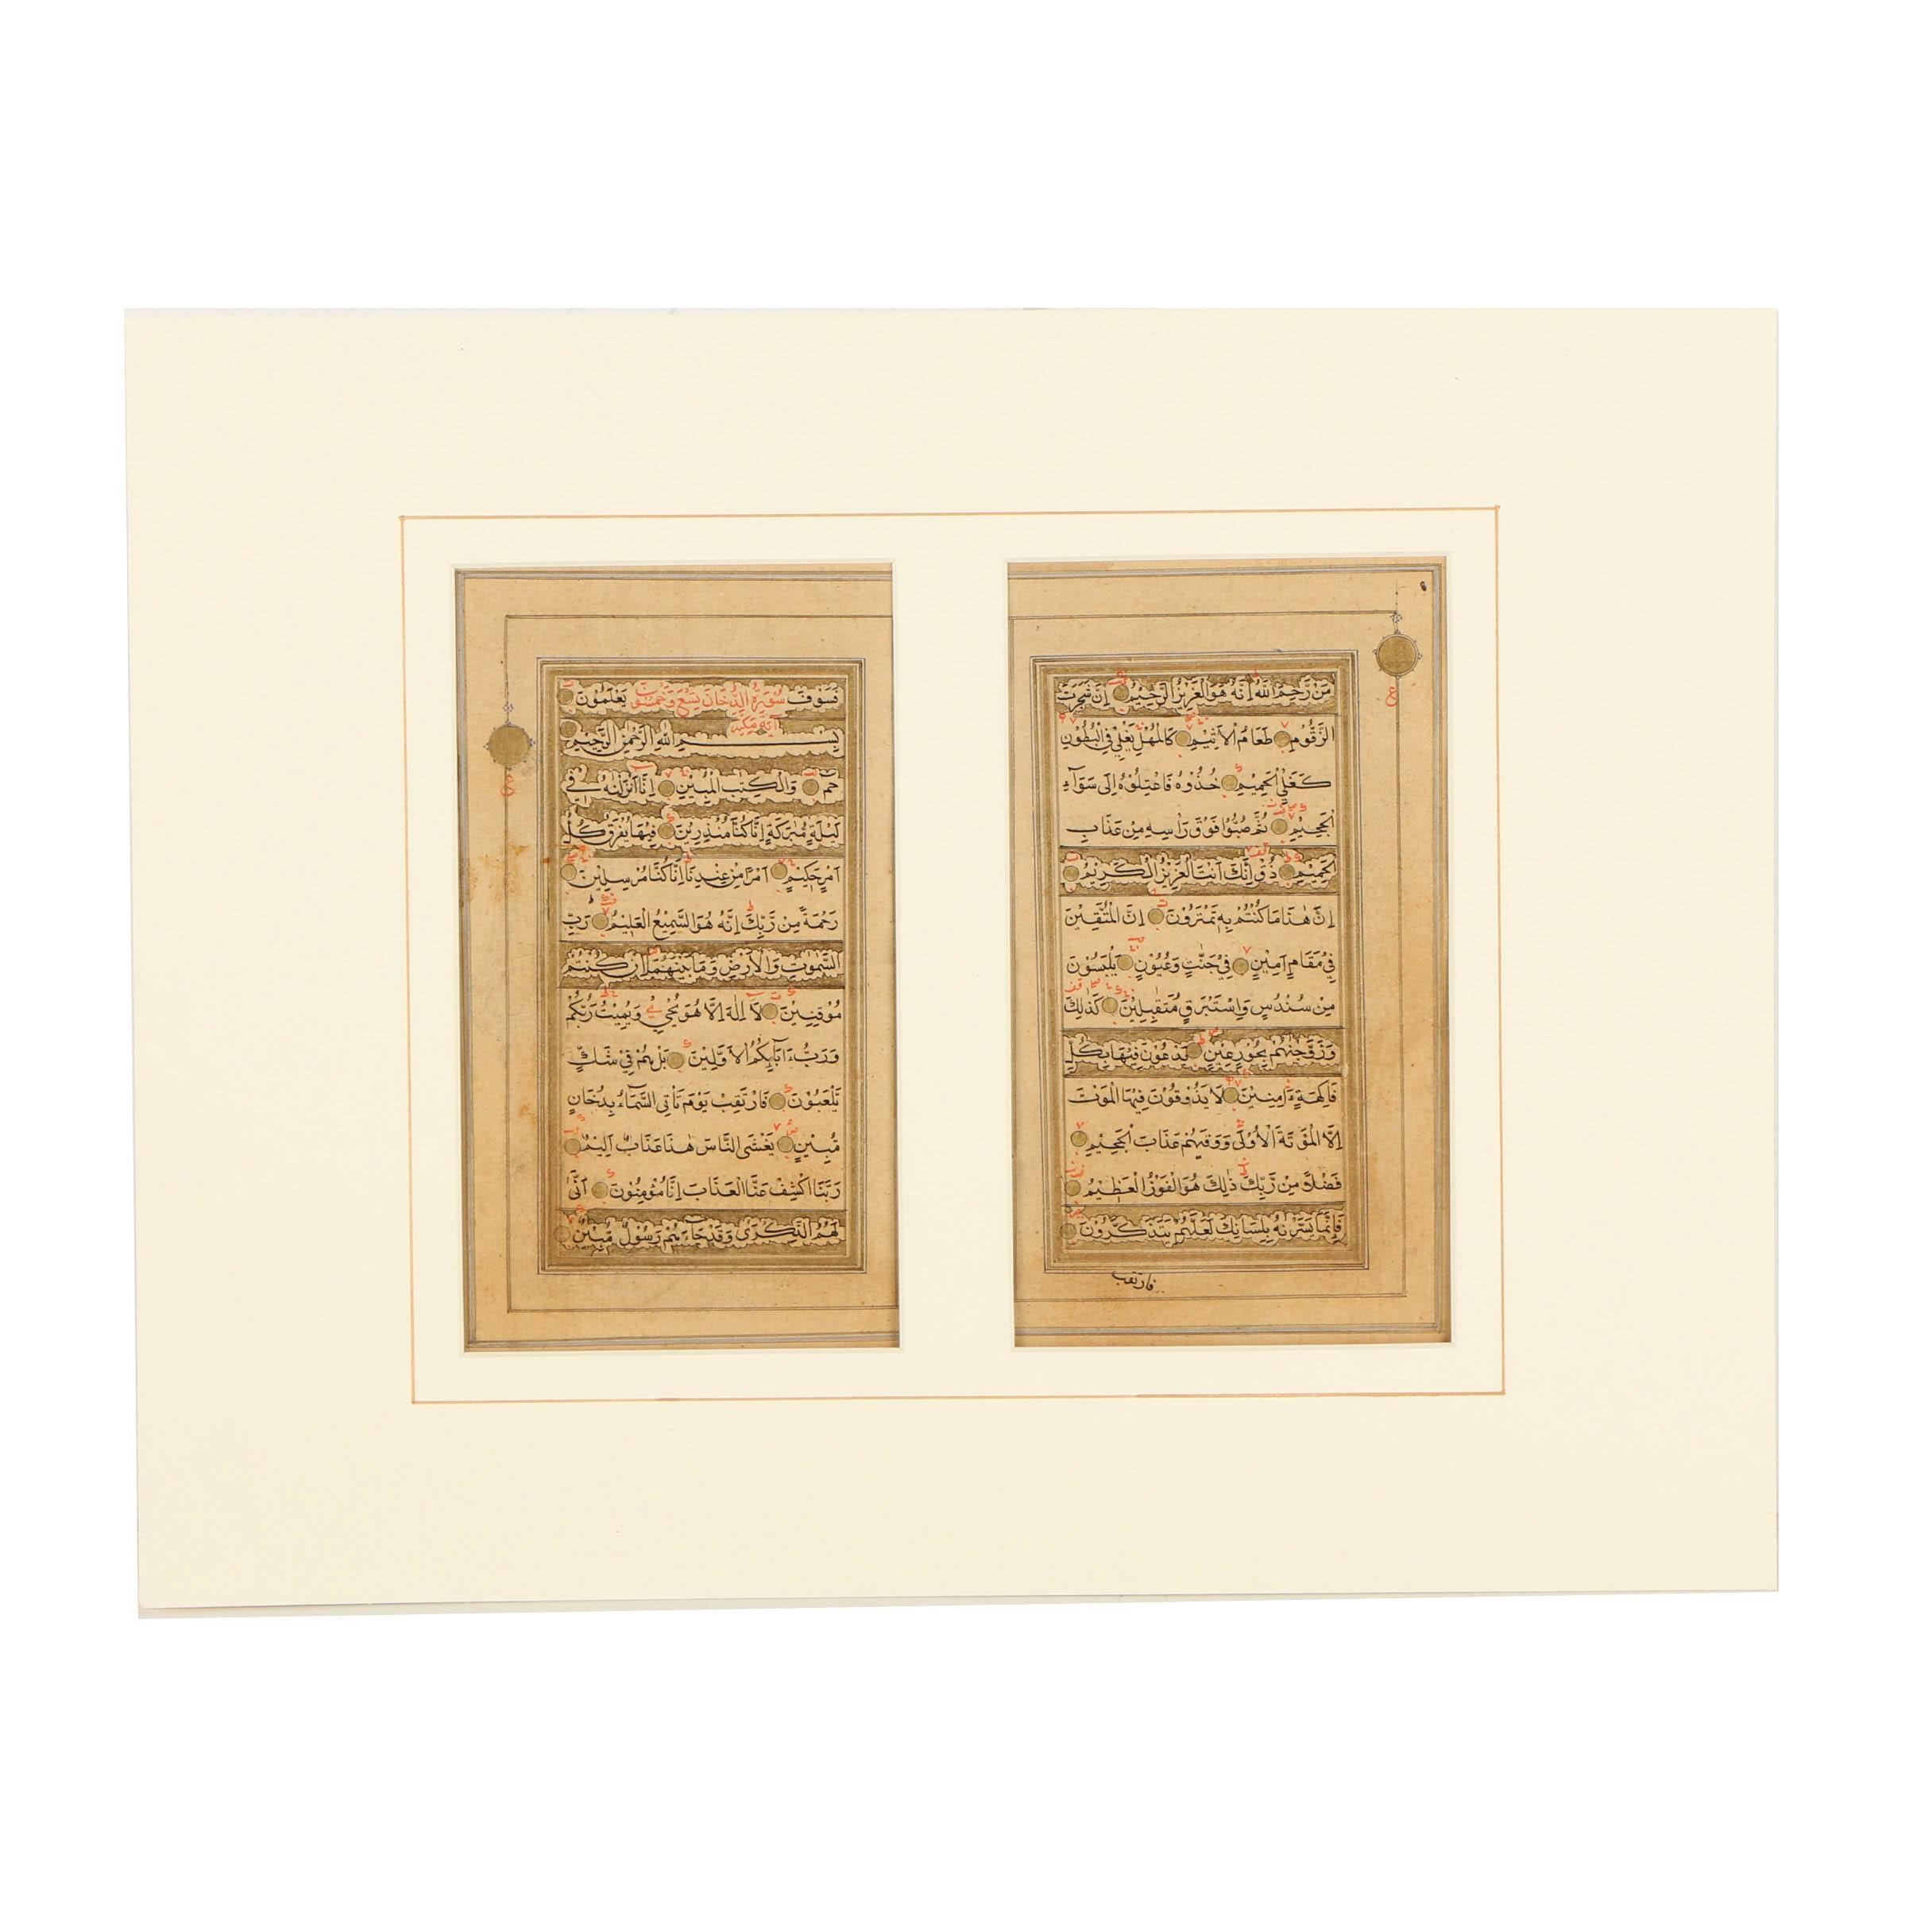 Antique Hand-Painted Persian Manuscript Pages